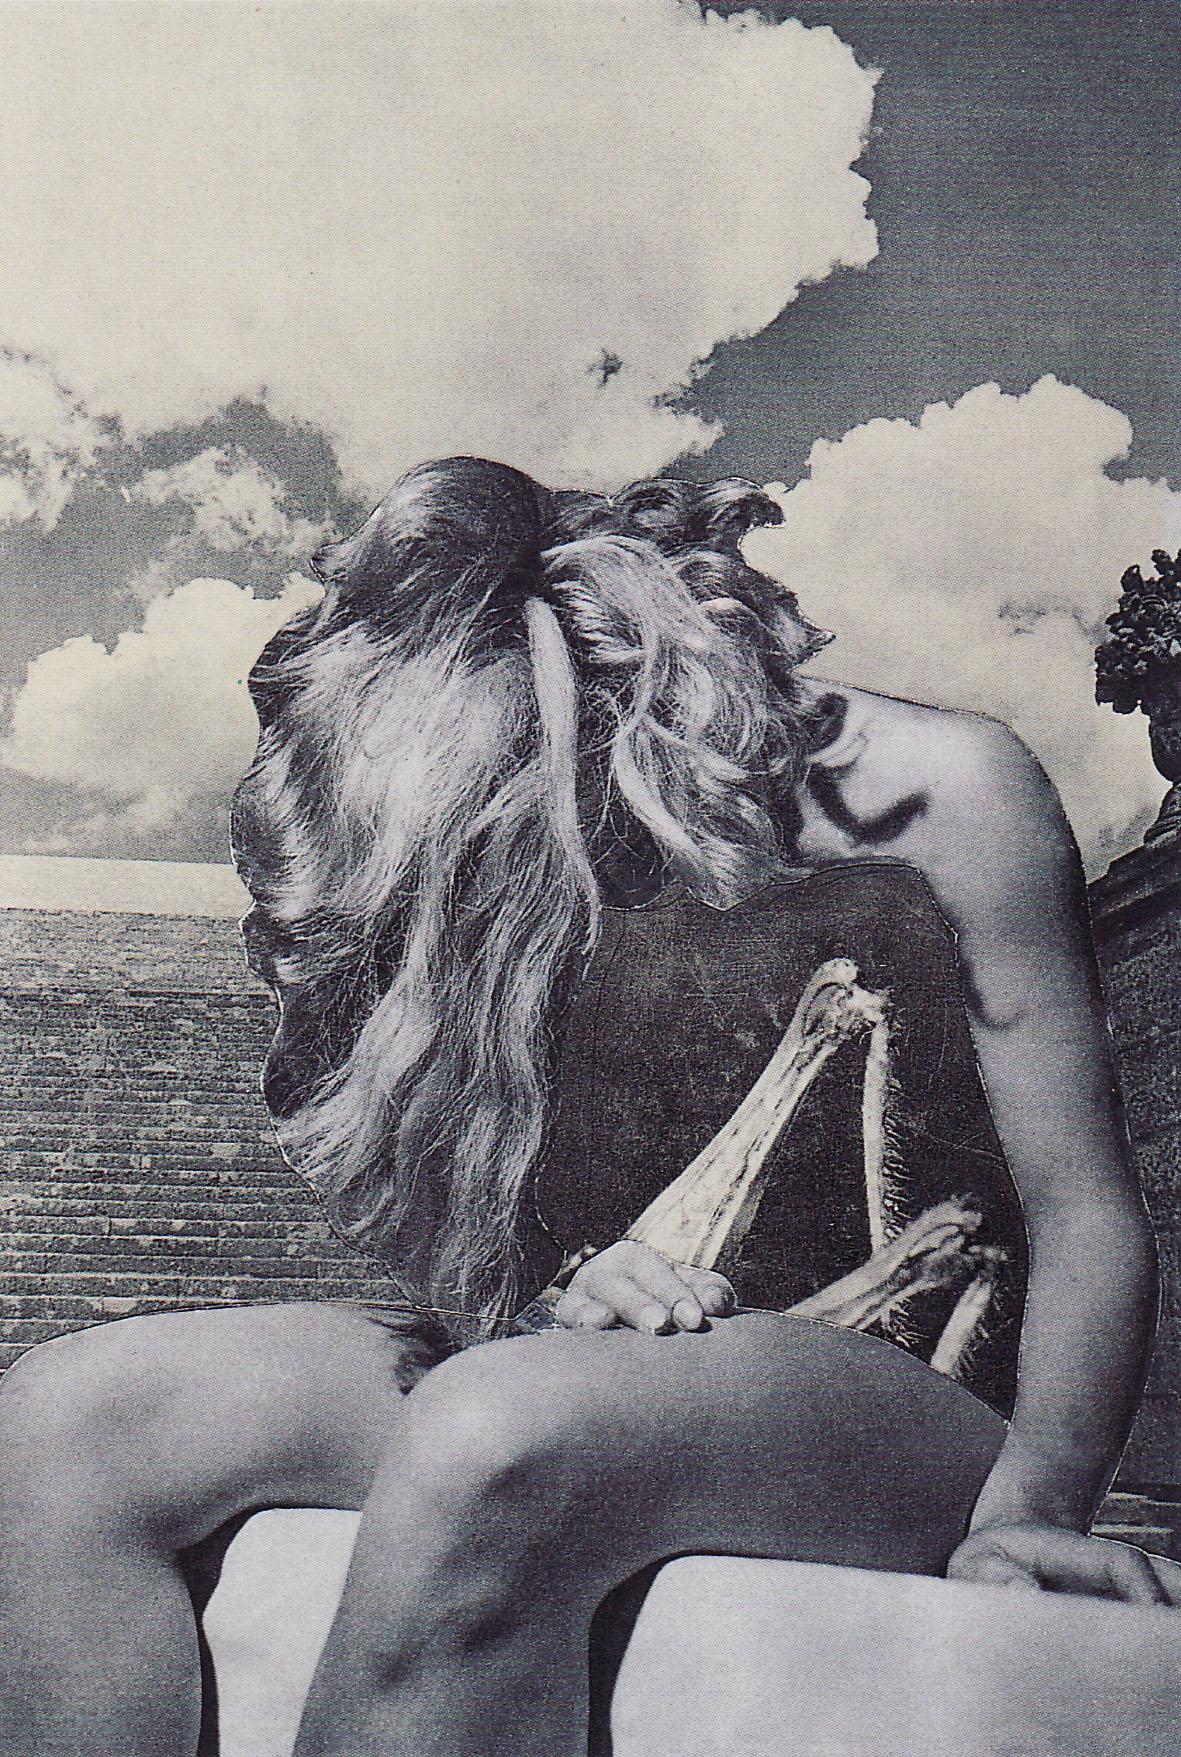 Karel Teige-Collage #247, 1942 . (c) Nachlass Karel Teige